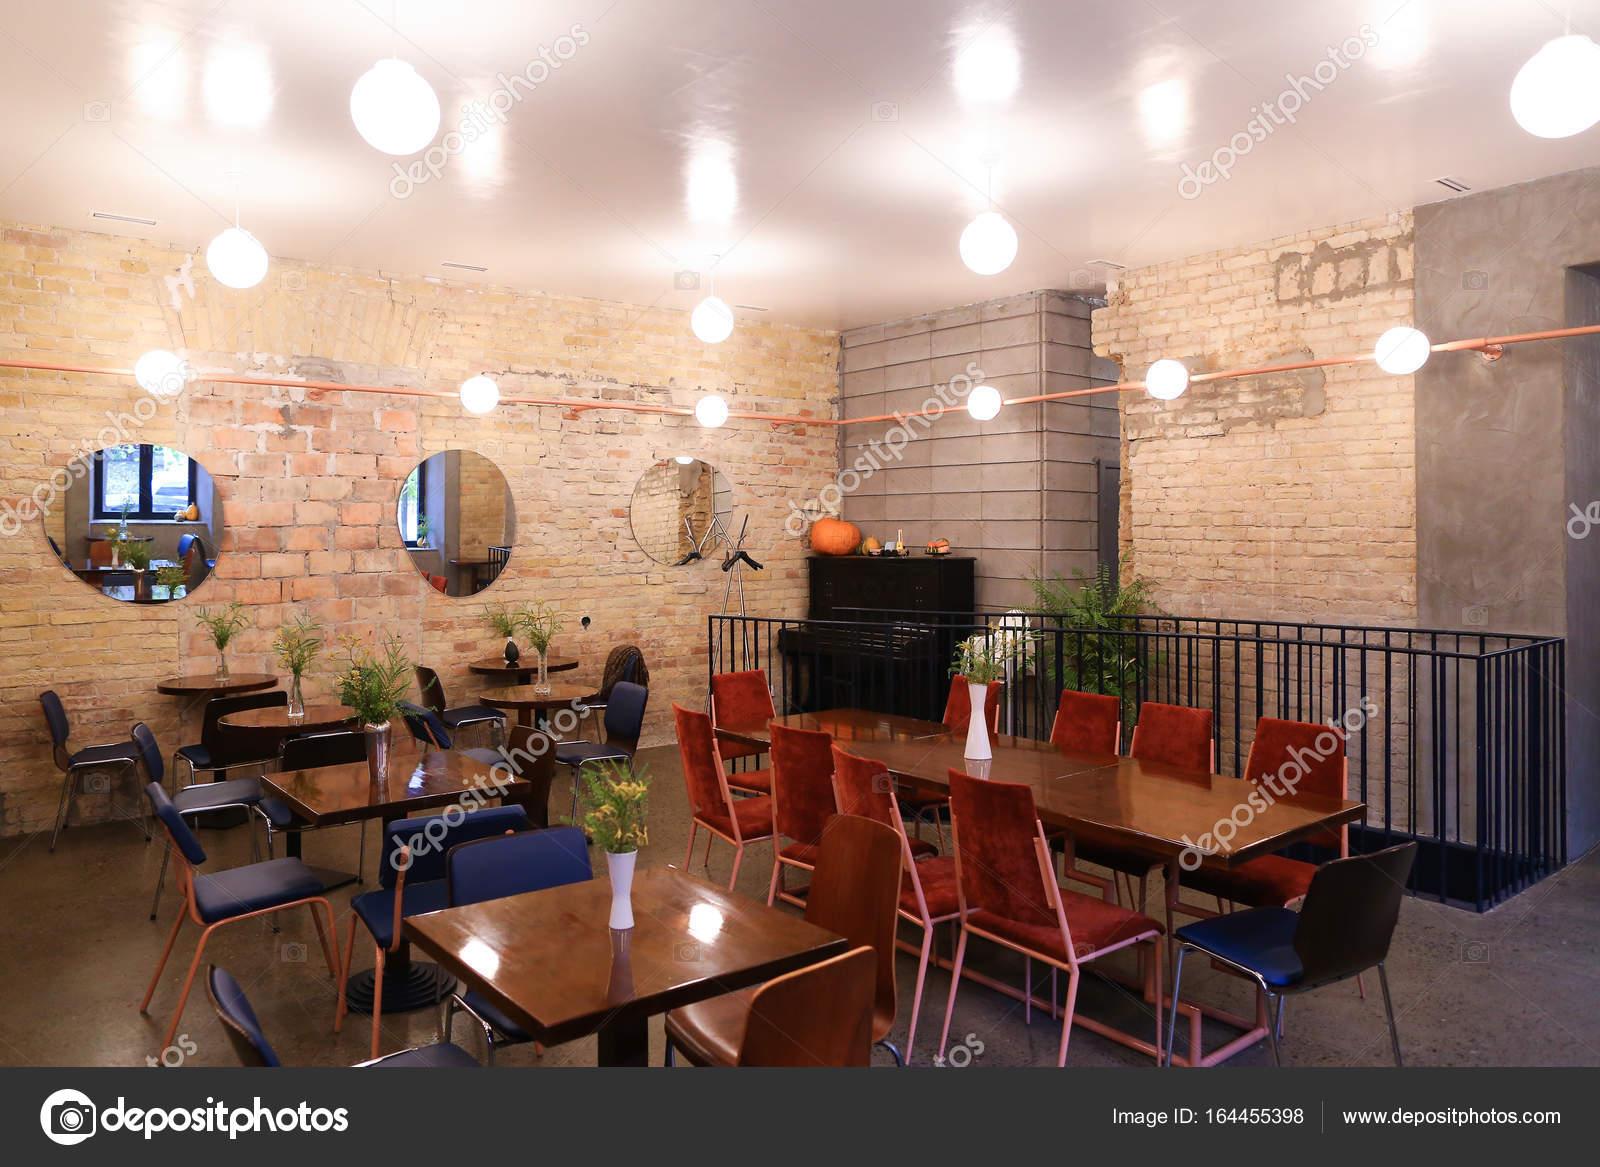 Beach Restaurant Decor Ideas Capture Design Ideas Trendy Cafe Or Restaurant Because Bar Stock Editorial Photo C Sisterspro 164455398